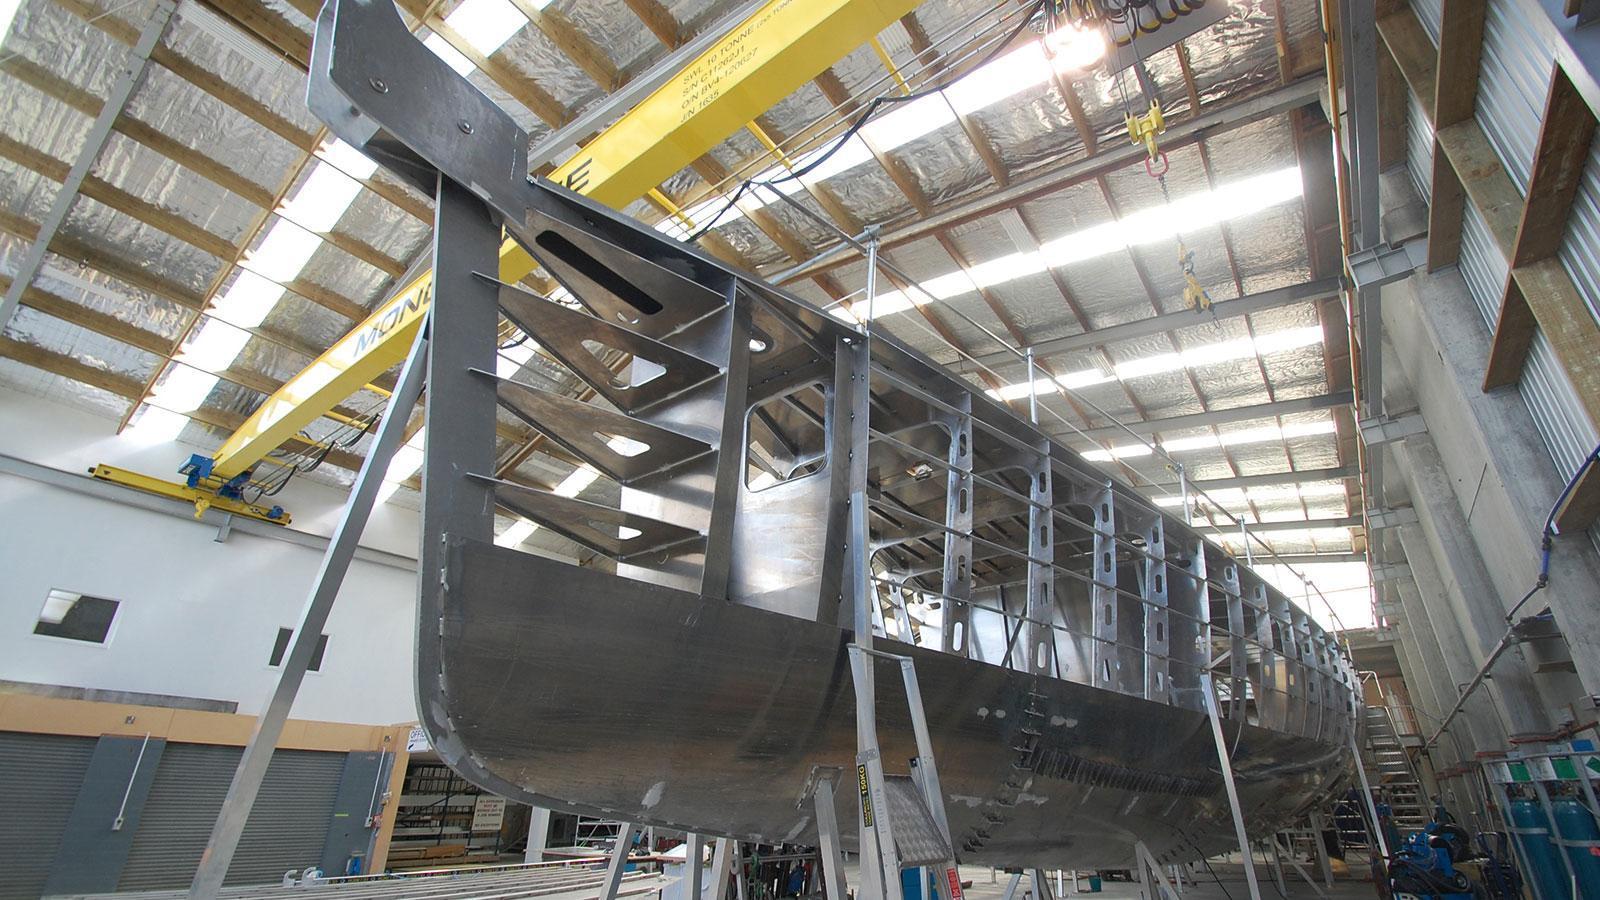 iceberg-motor-yacht-circa-marine-fpb-97-2015-34m-hull